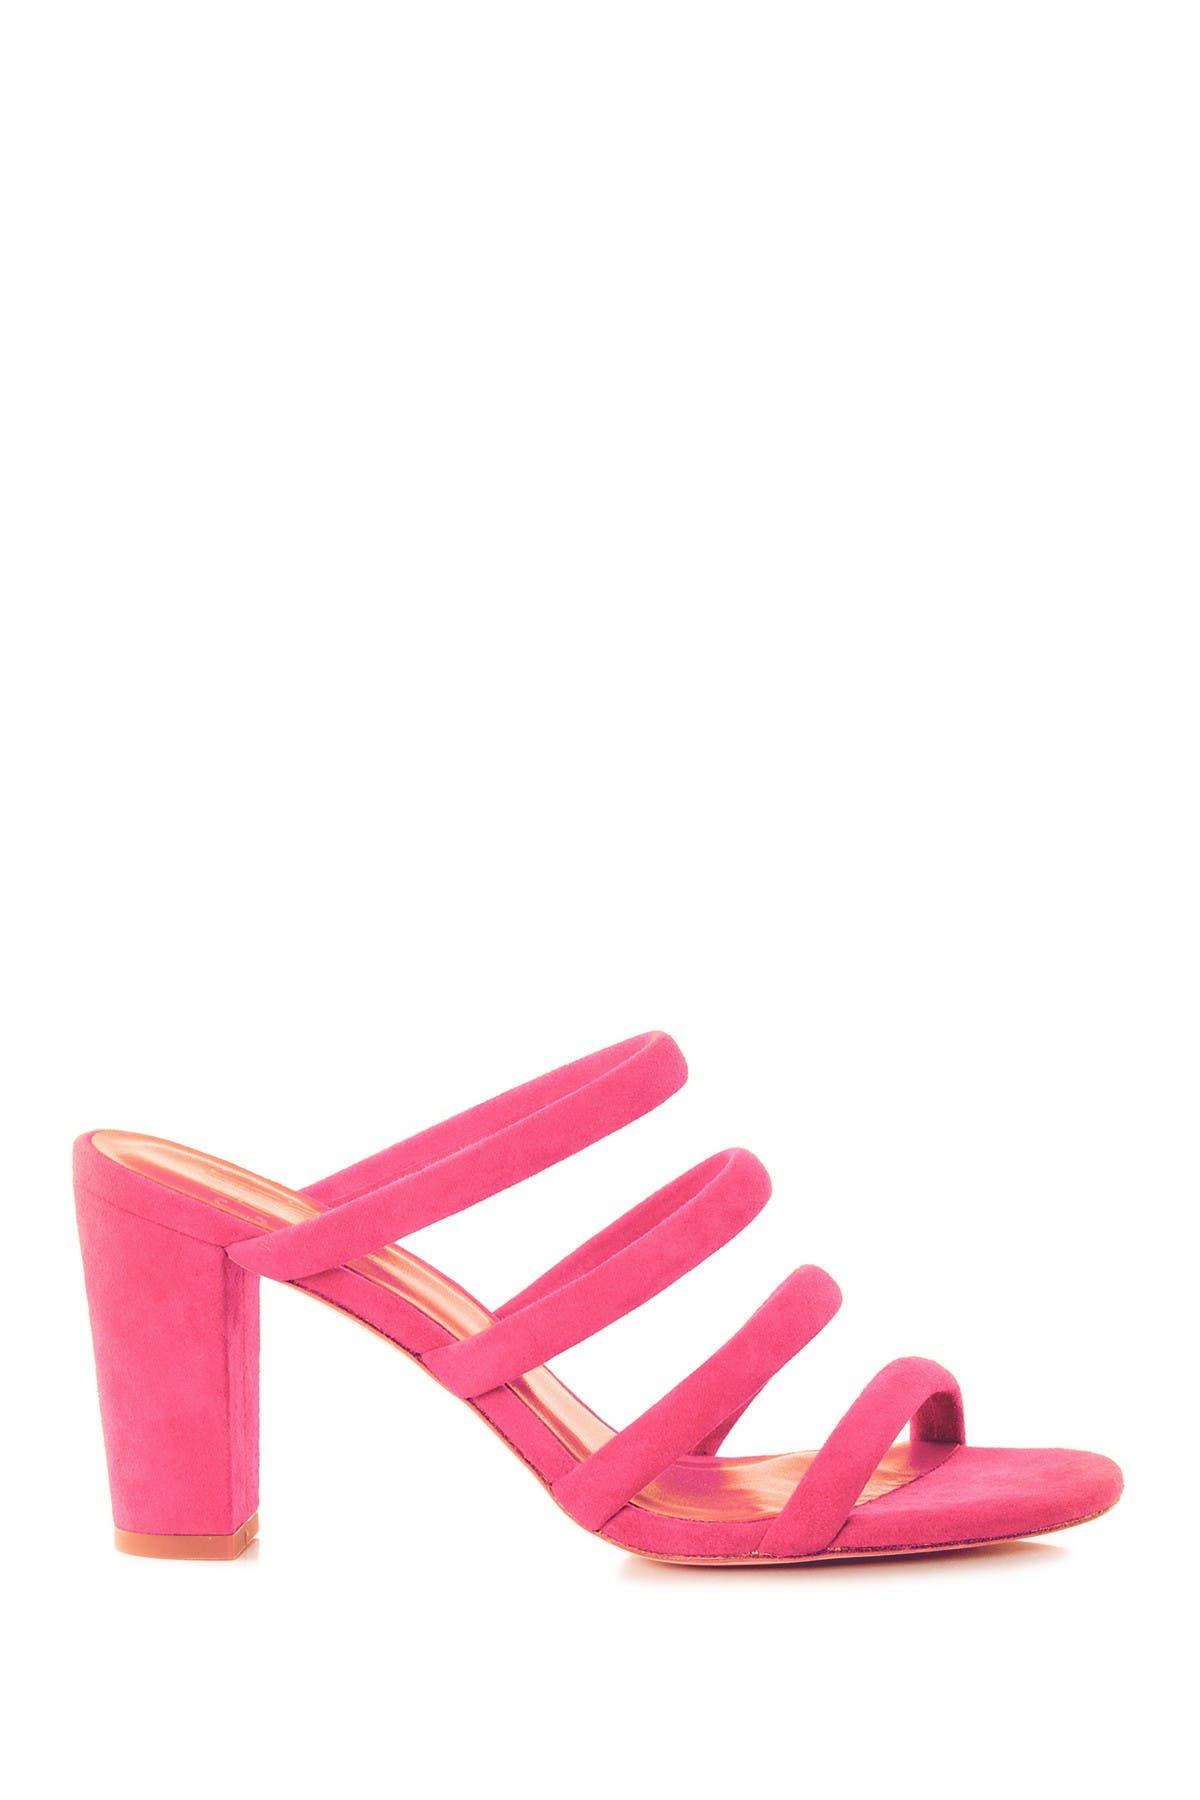 Image of CHARLOTTE STONE Bettina Suede Block Heel Sandal